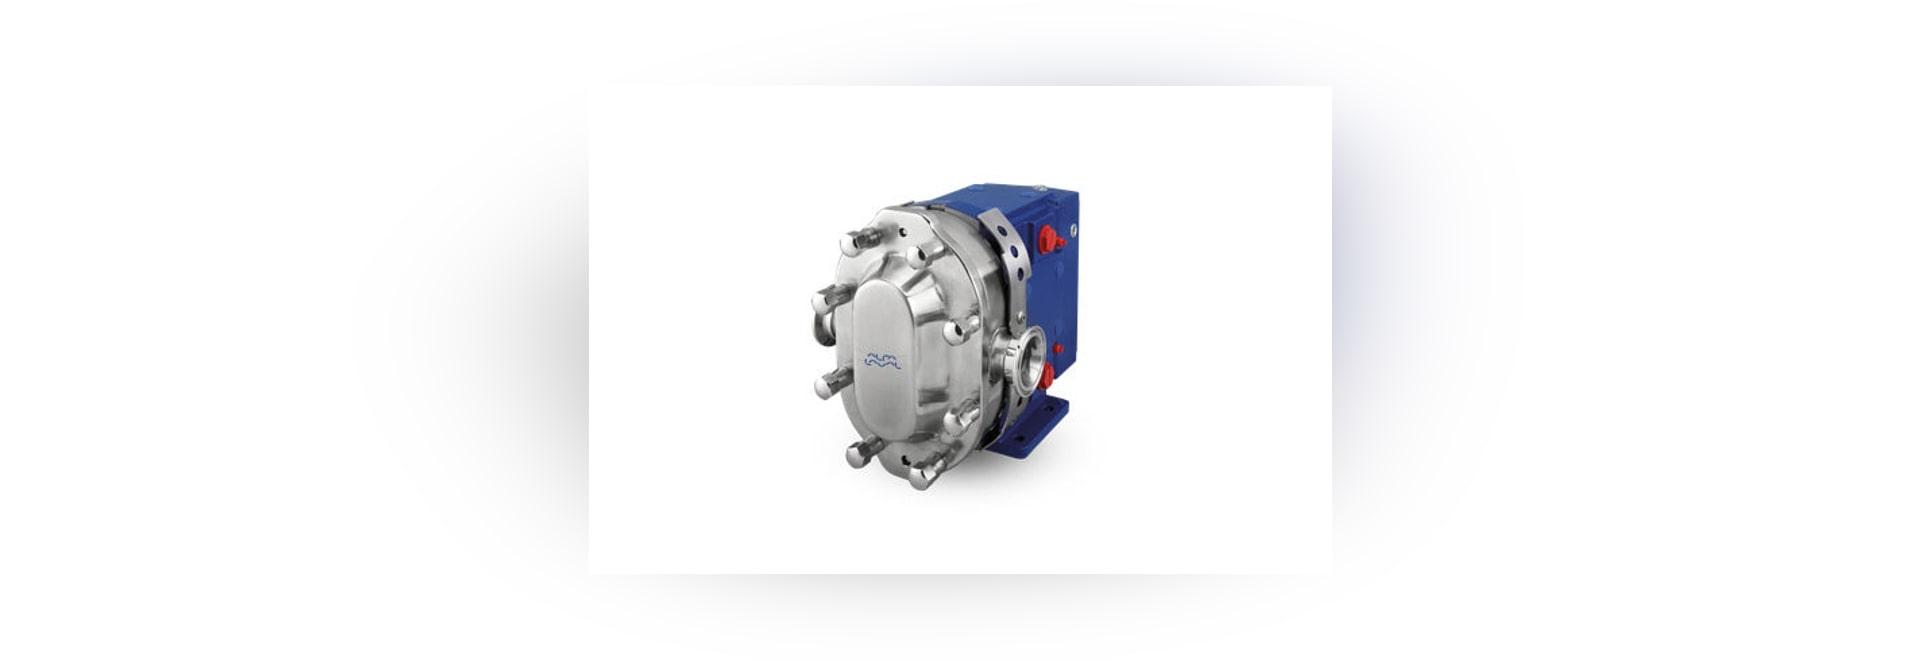 NEU: Kolbenpumpe durch Alfa Laval